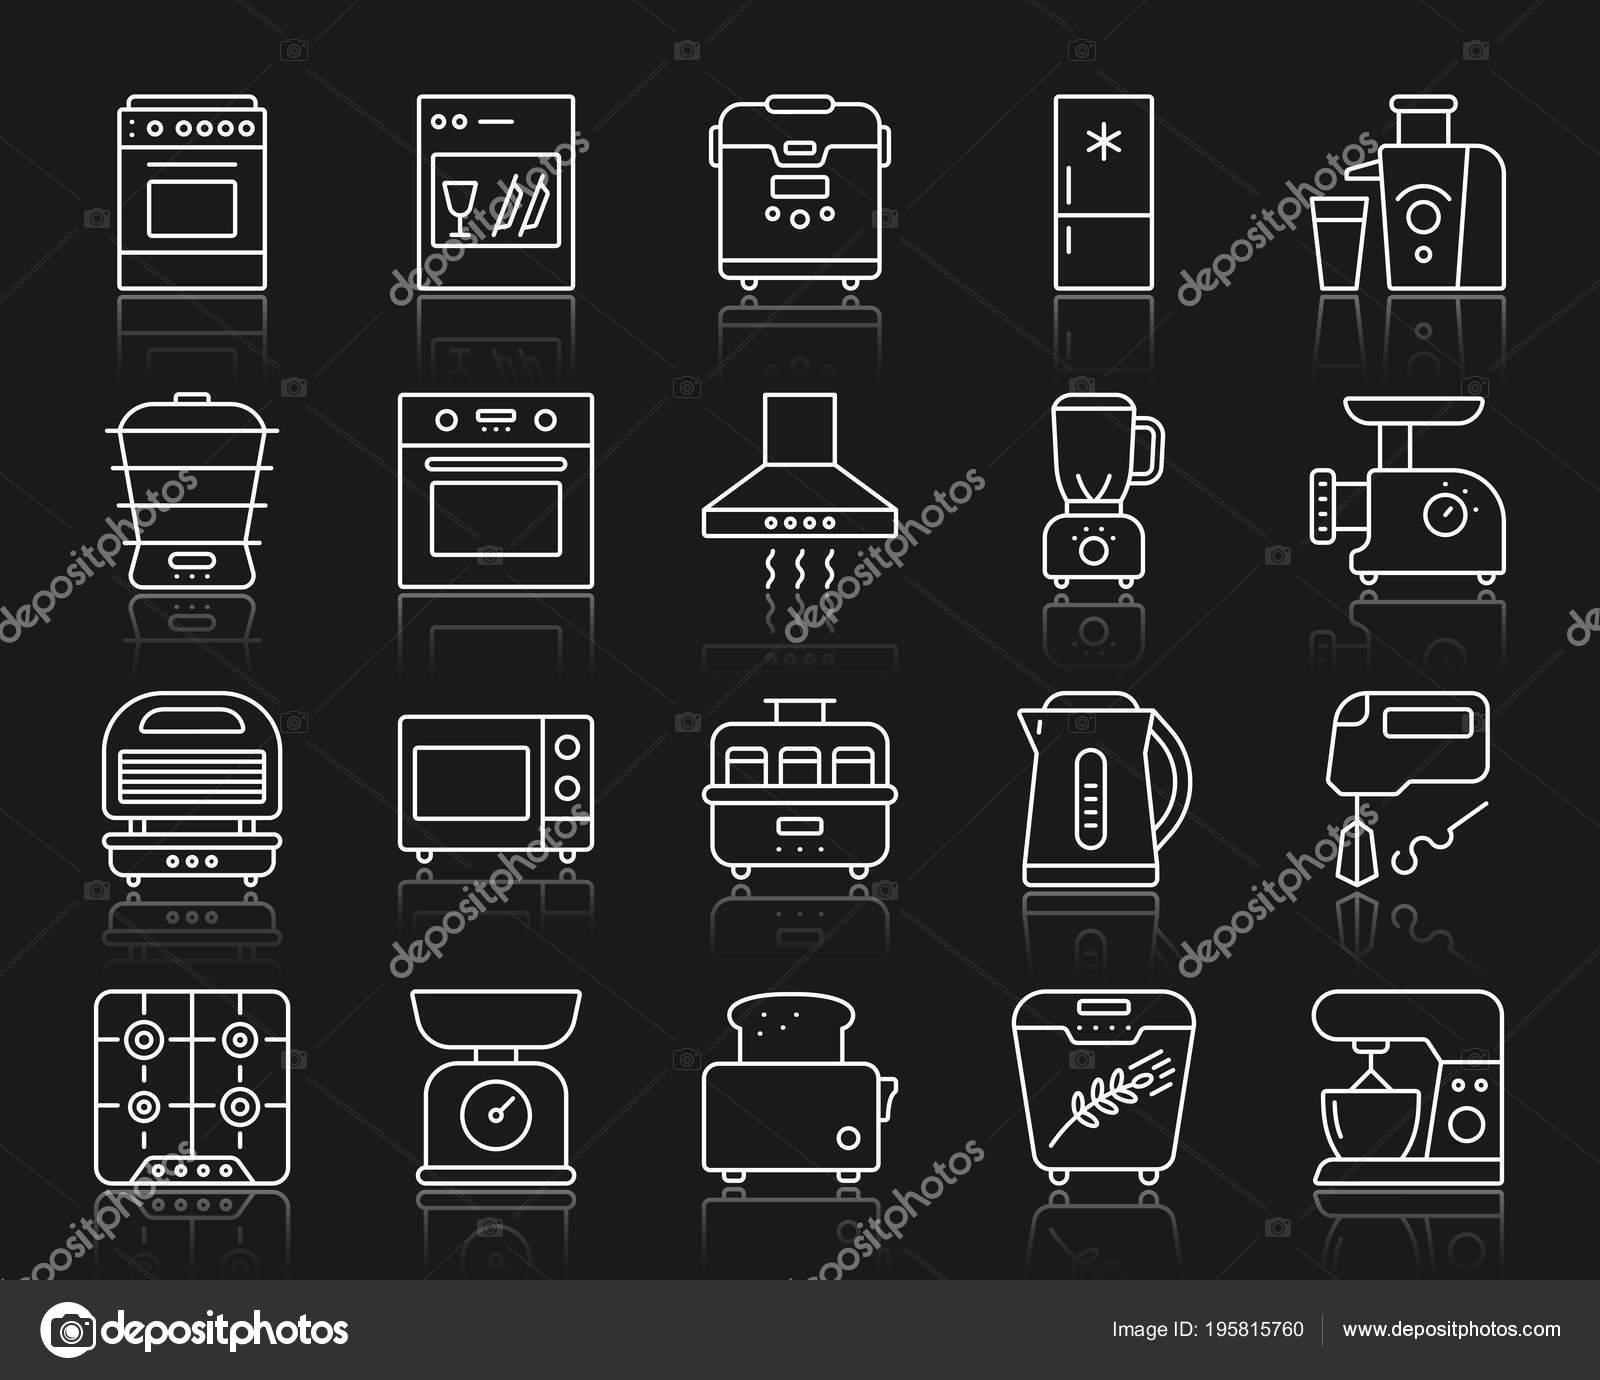 kitchen appliance suite backyard 厨房用具薄线图标设置概述了设备矢量图的web 符号套件厨房用具线性图标 符号套件厨房